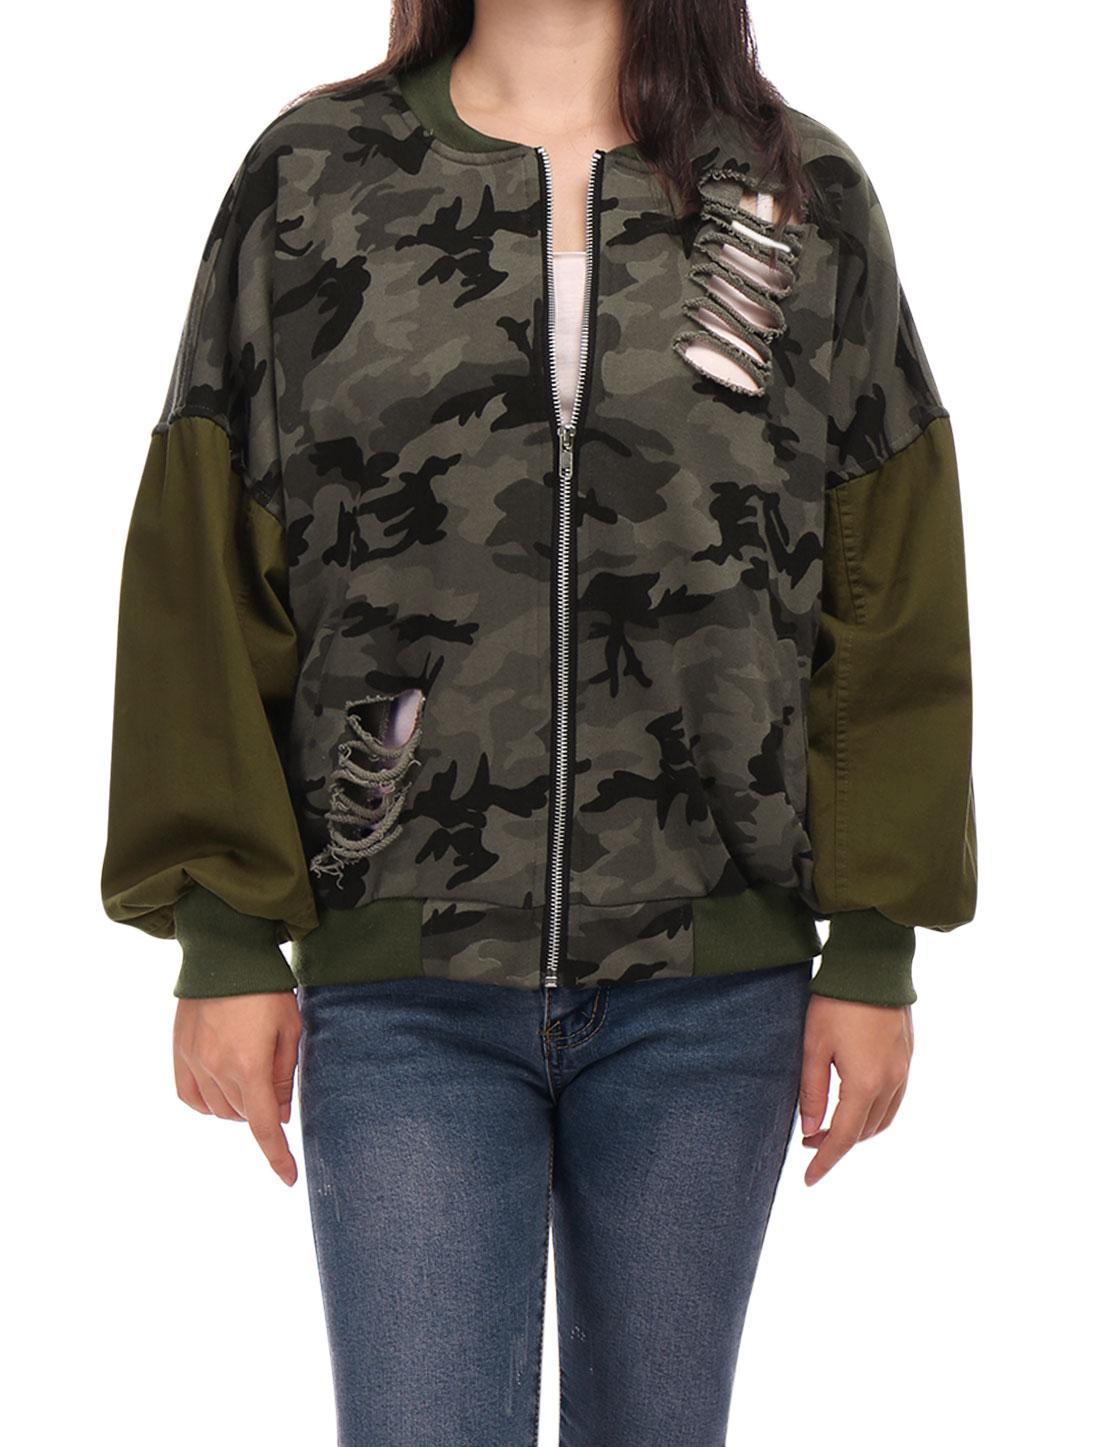 Women Drop Shoulder Camouflage Pattern Destroyed Jacket Brown XS